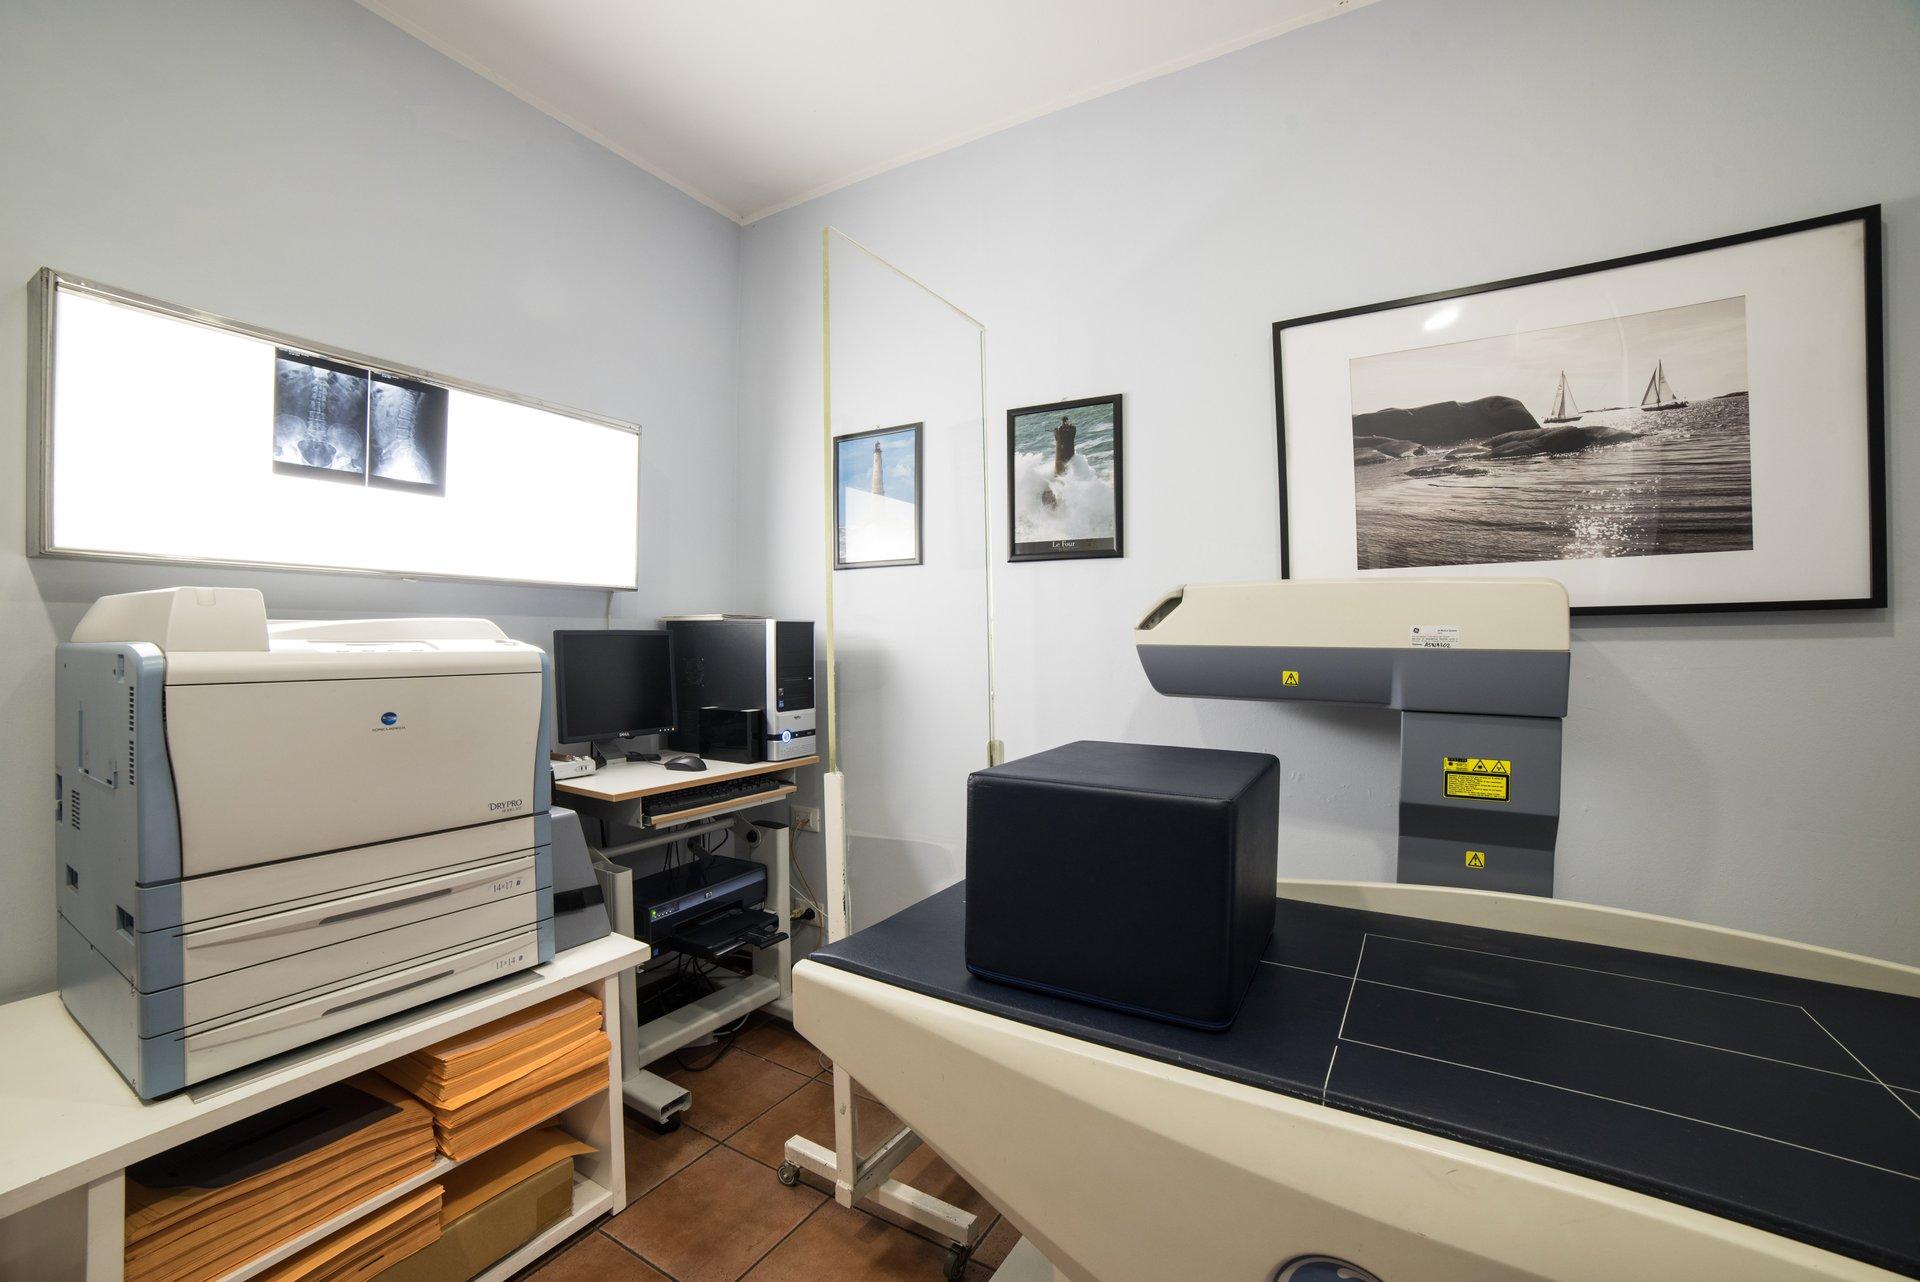 istituto radiologico beretta - tac